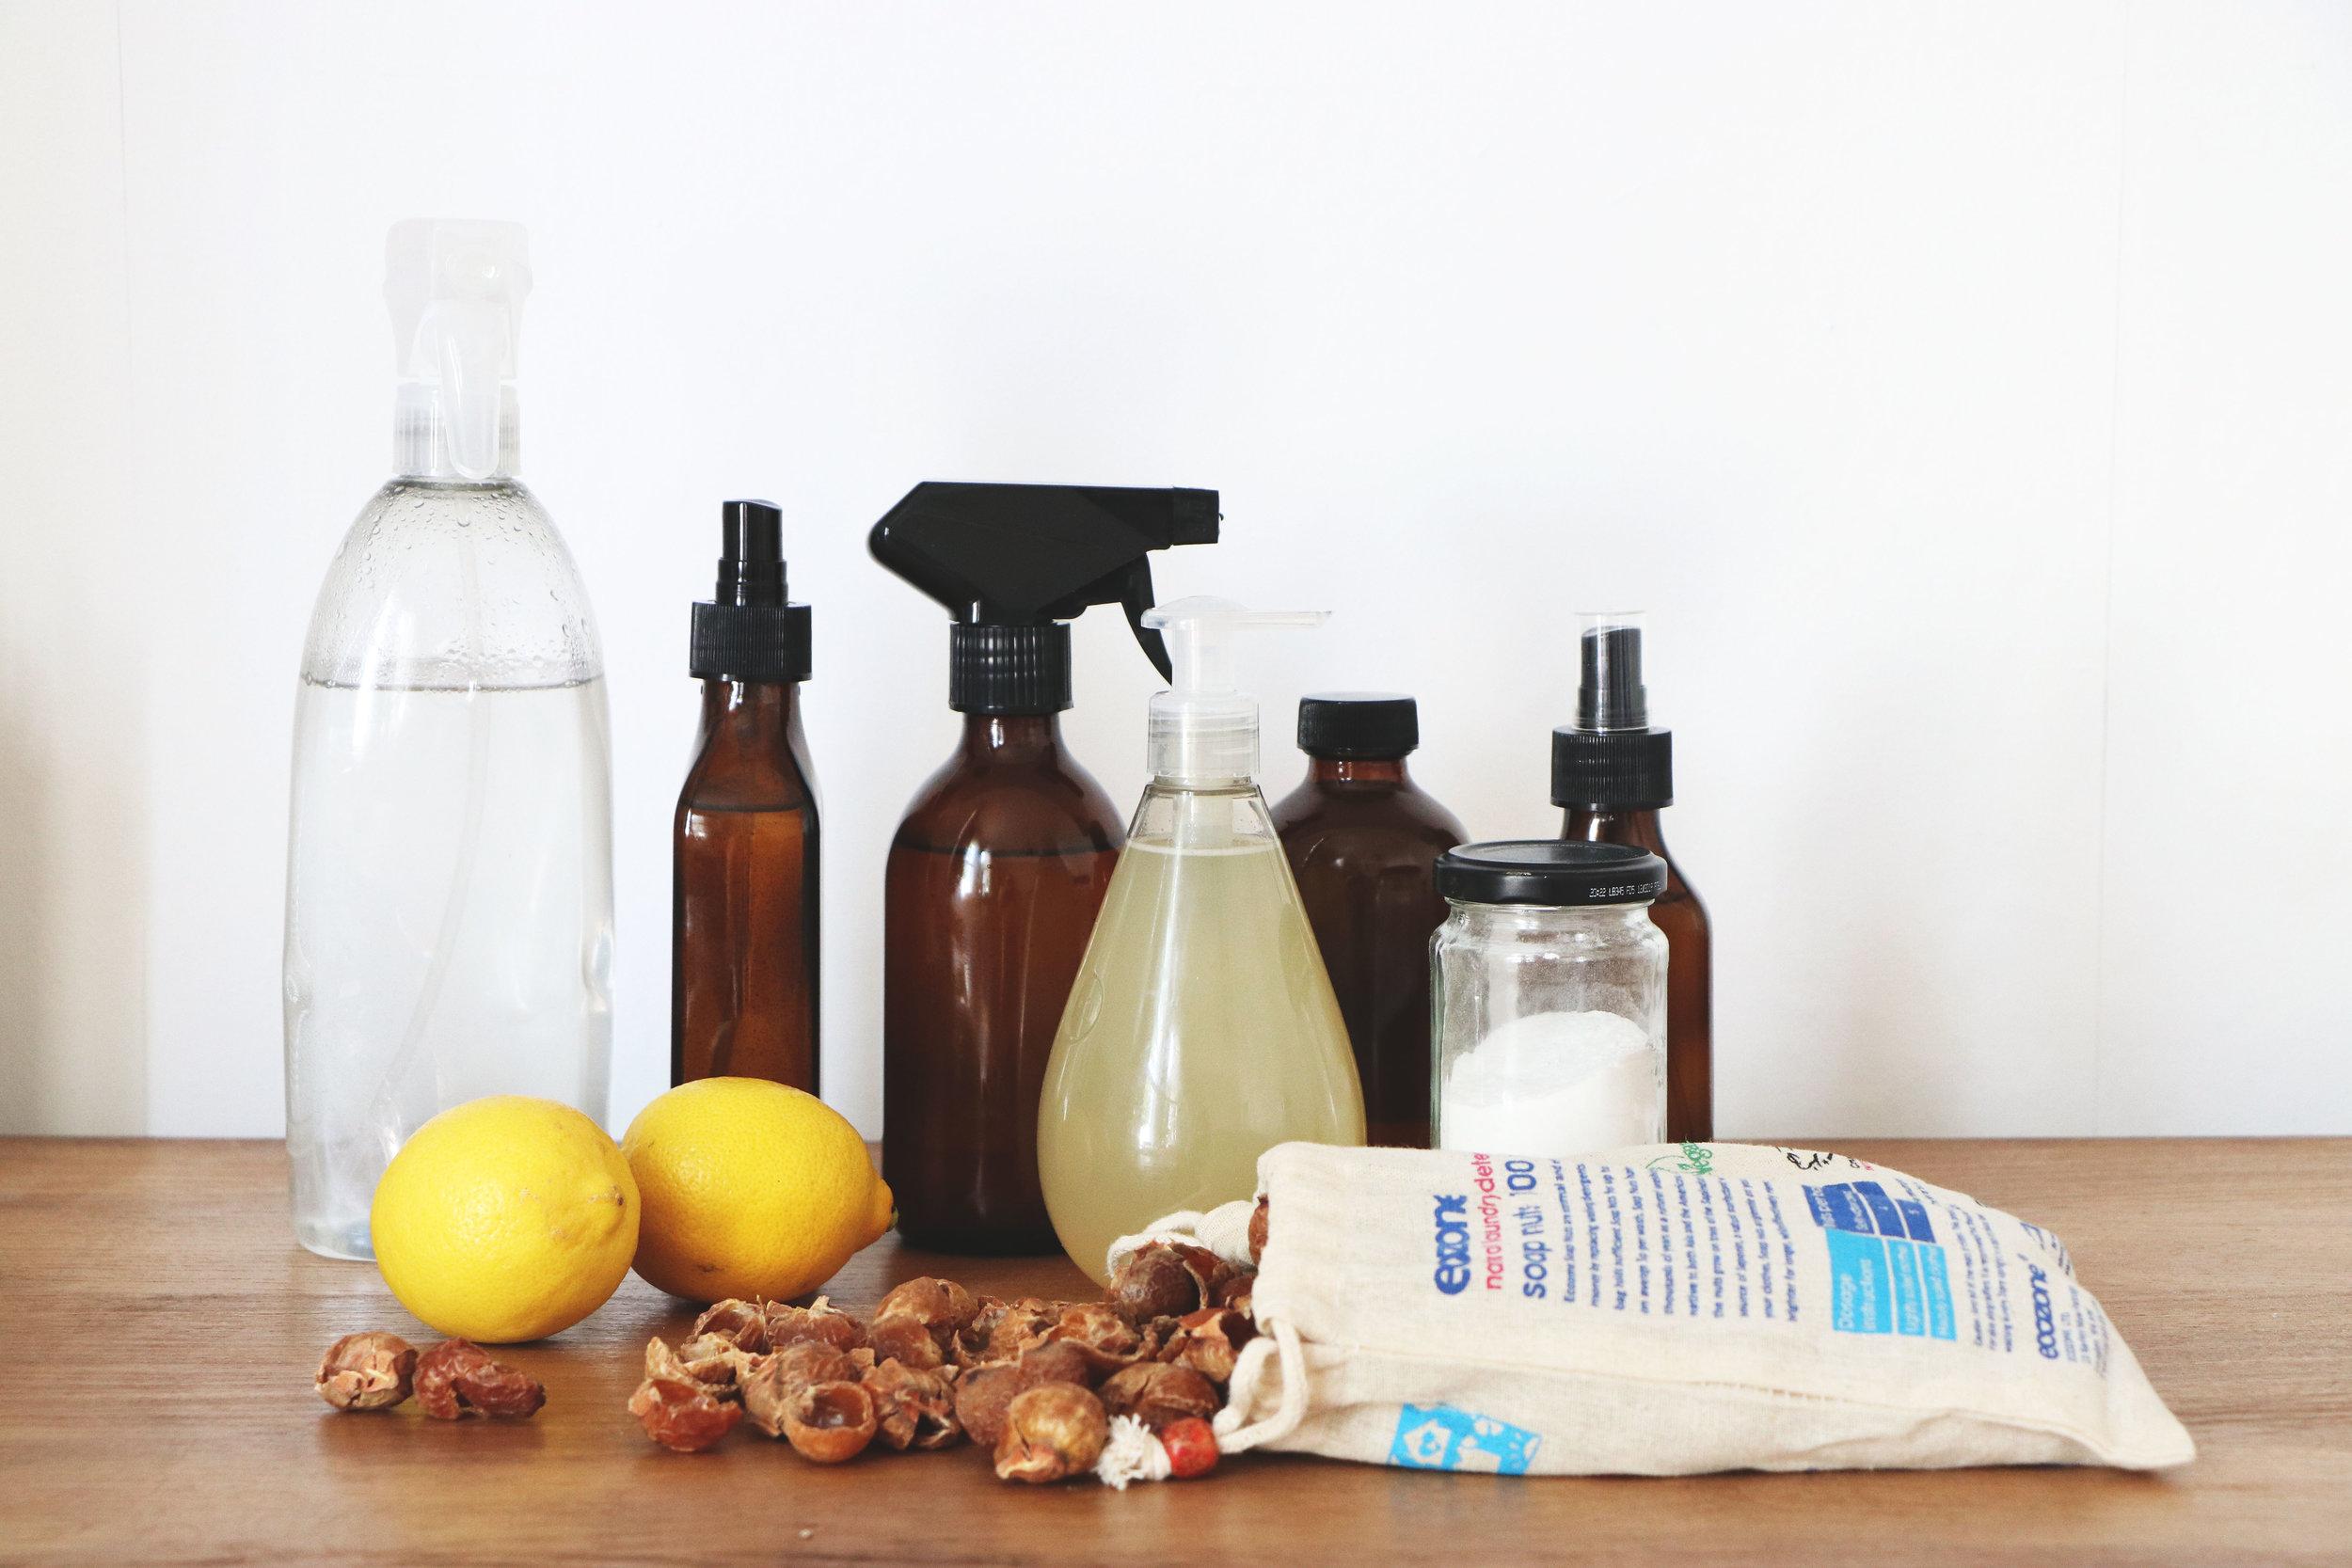 20 DIY NATURAL CLEANING RECIPES, TIPS